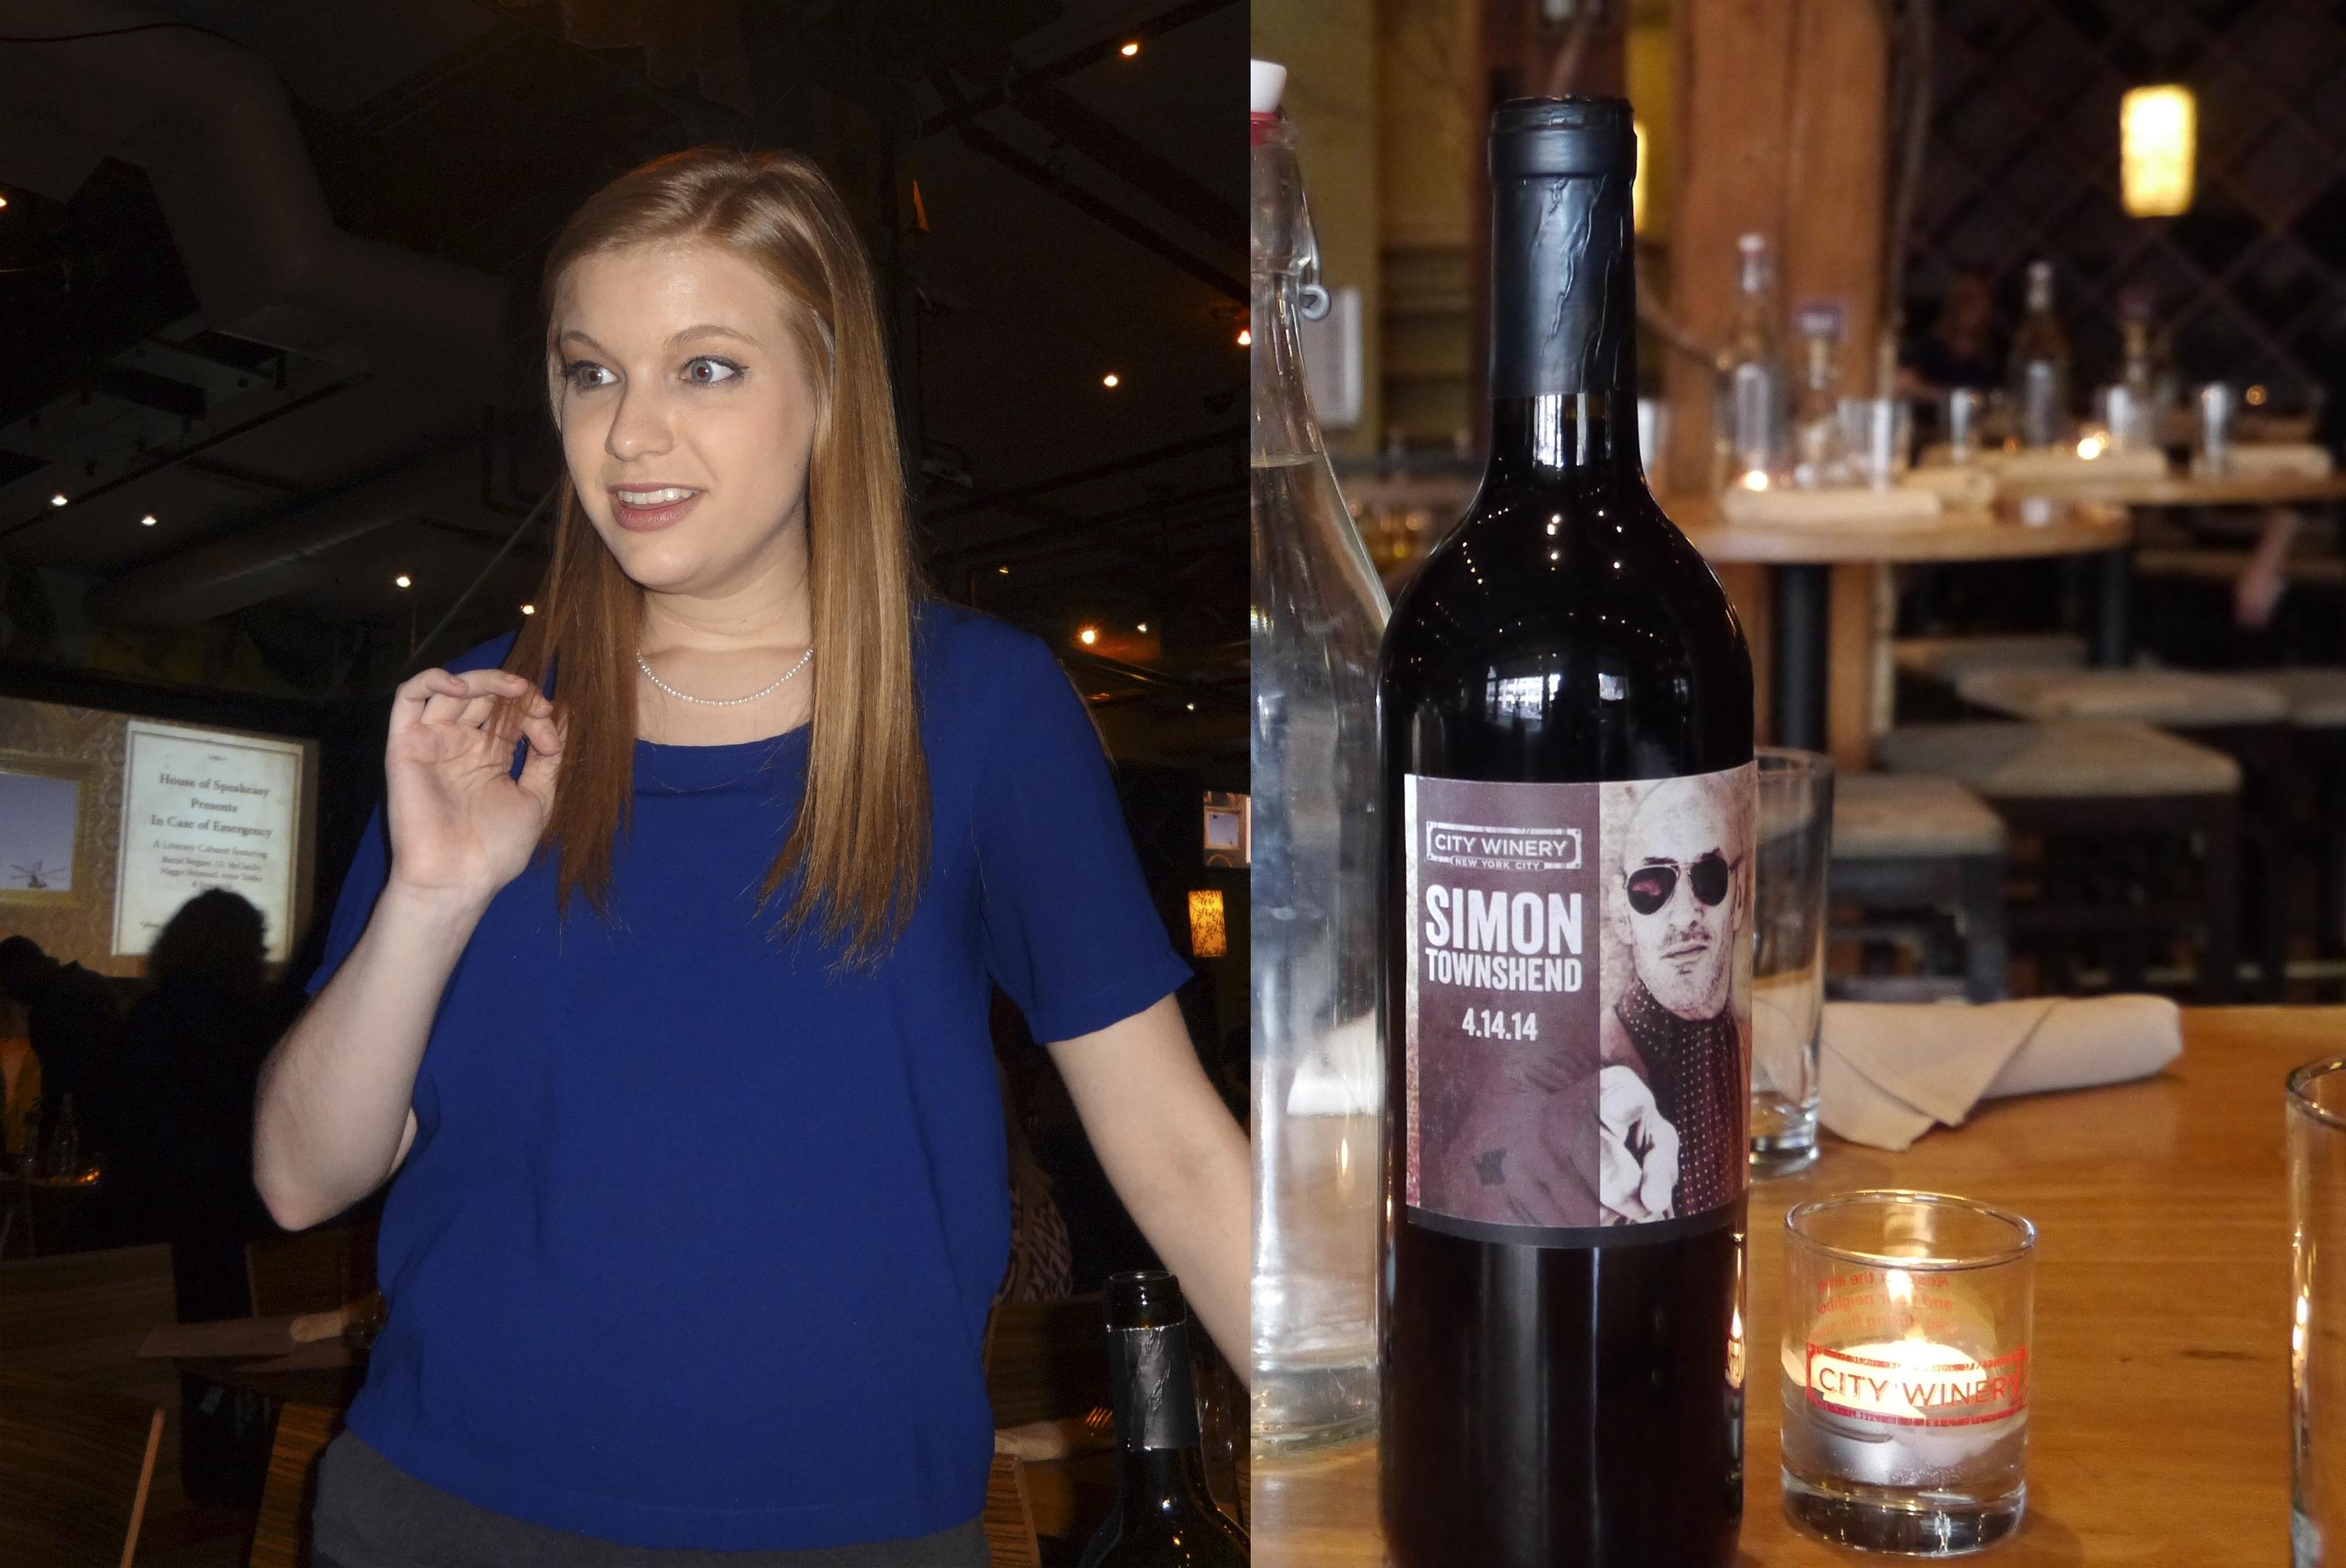 City Winery wine lady